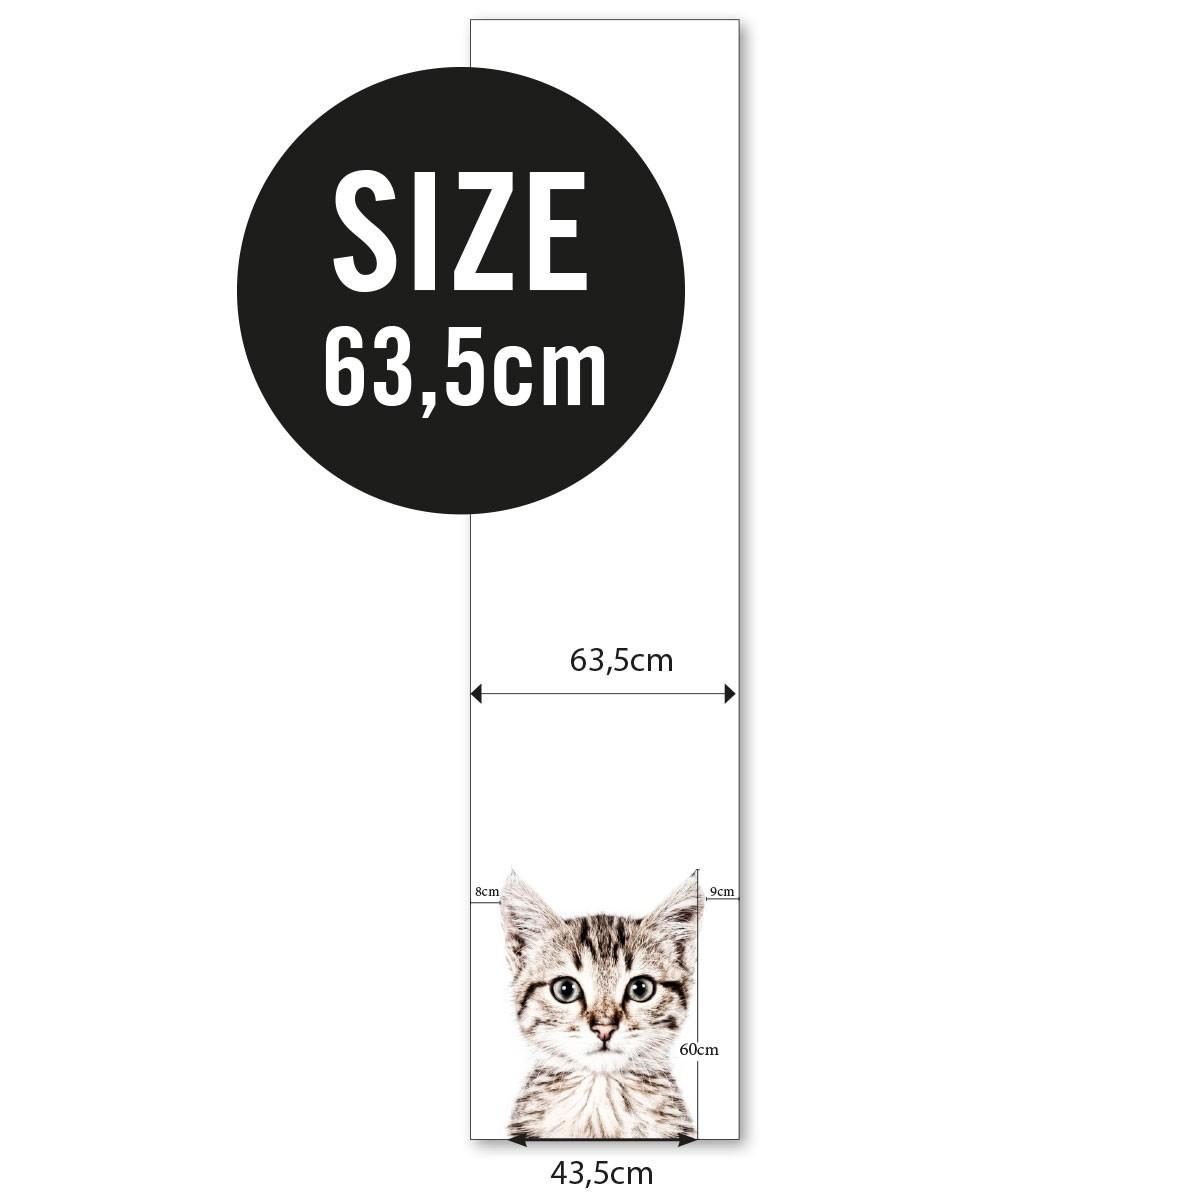 Magnettapet (63,5 x 265 cm) - KATT - från Groovy magnets